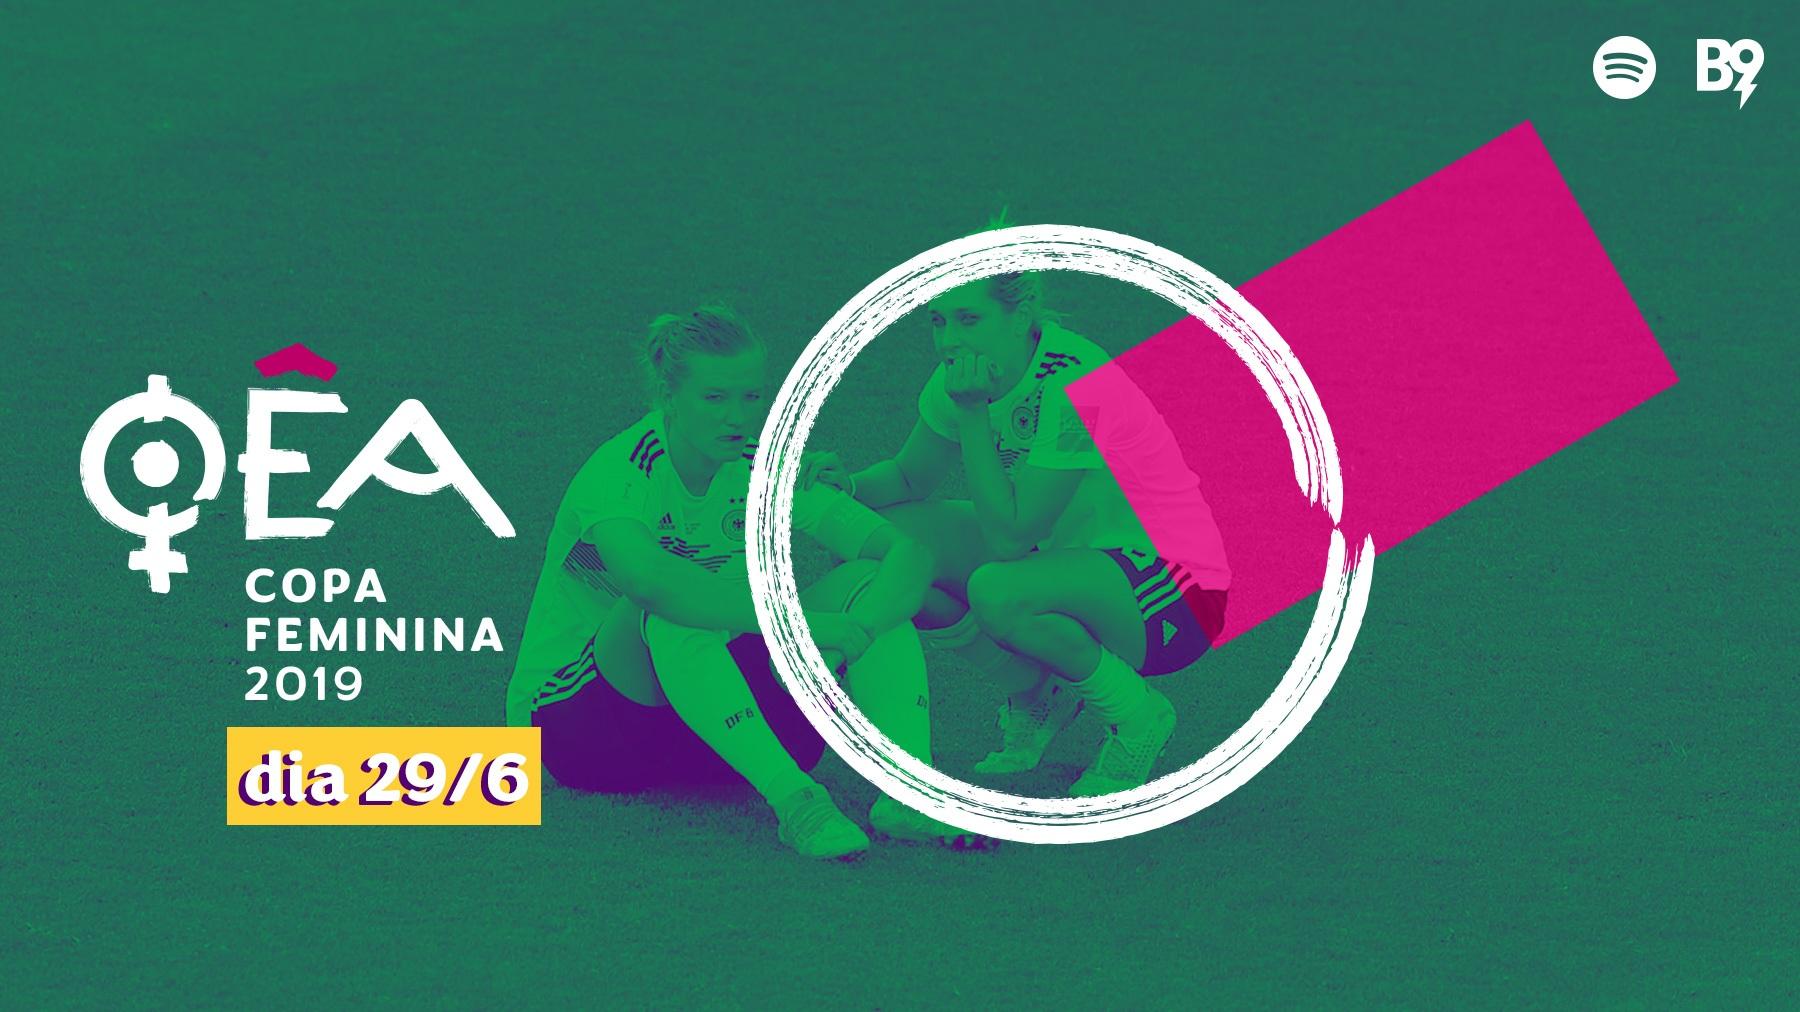 Oêa: Copa 2019 — 🇮🇹 0-2 🇳🇱 / 🇩🇪 1-2 🇸🇪